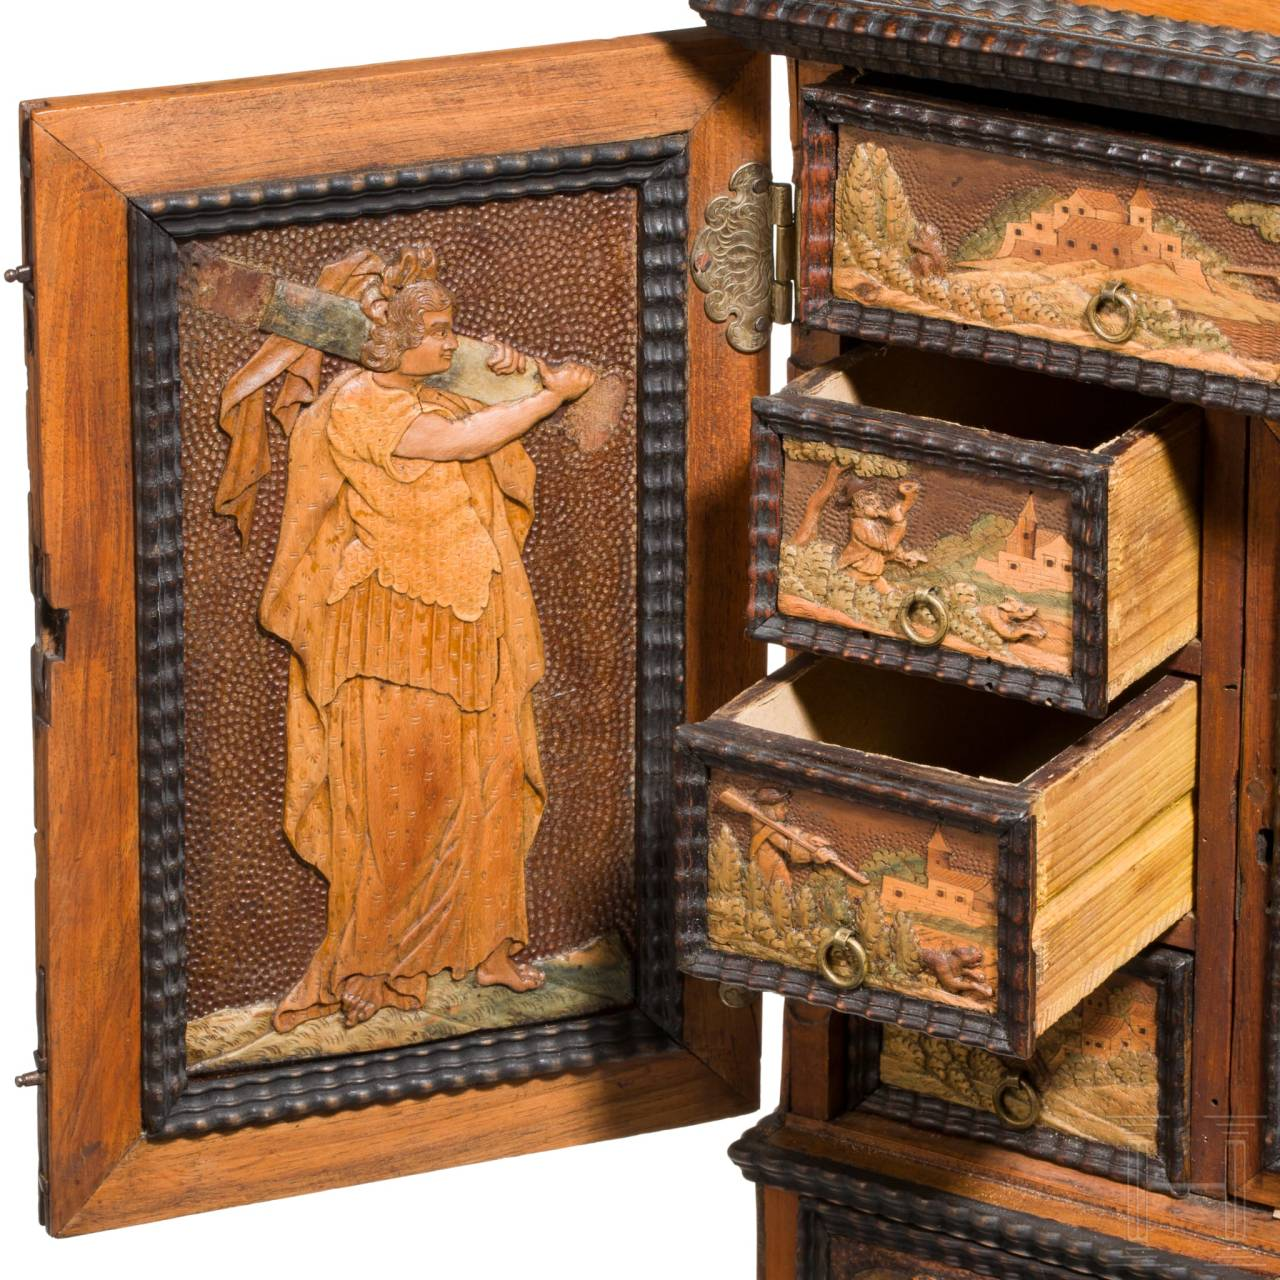 A fine, small Eger cabinet casket from the estate of Count von Solms, workshop of Johann Karl Haberstumpf (1654 - 1724), Eger, circa 1690 – 1710